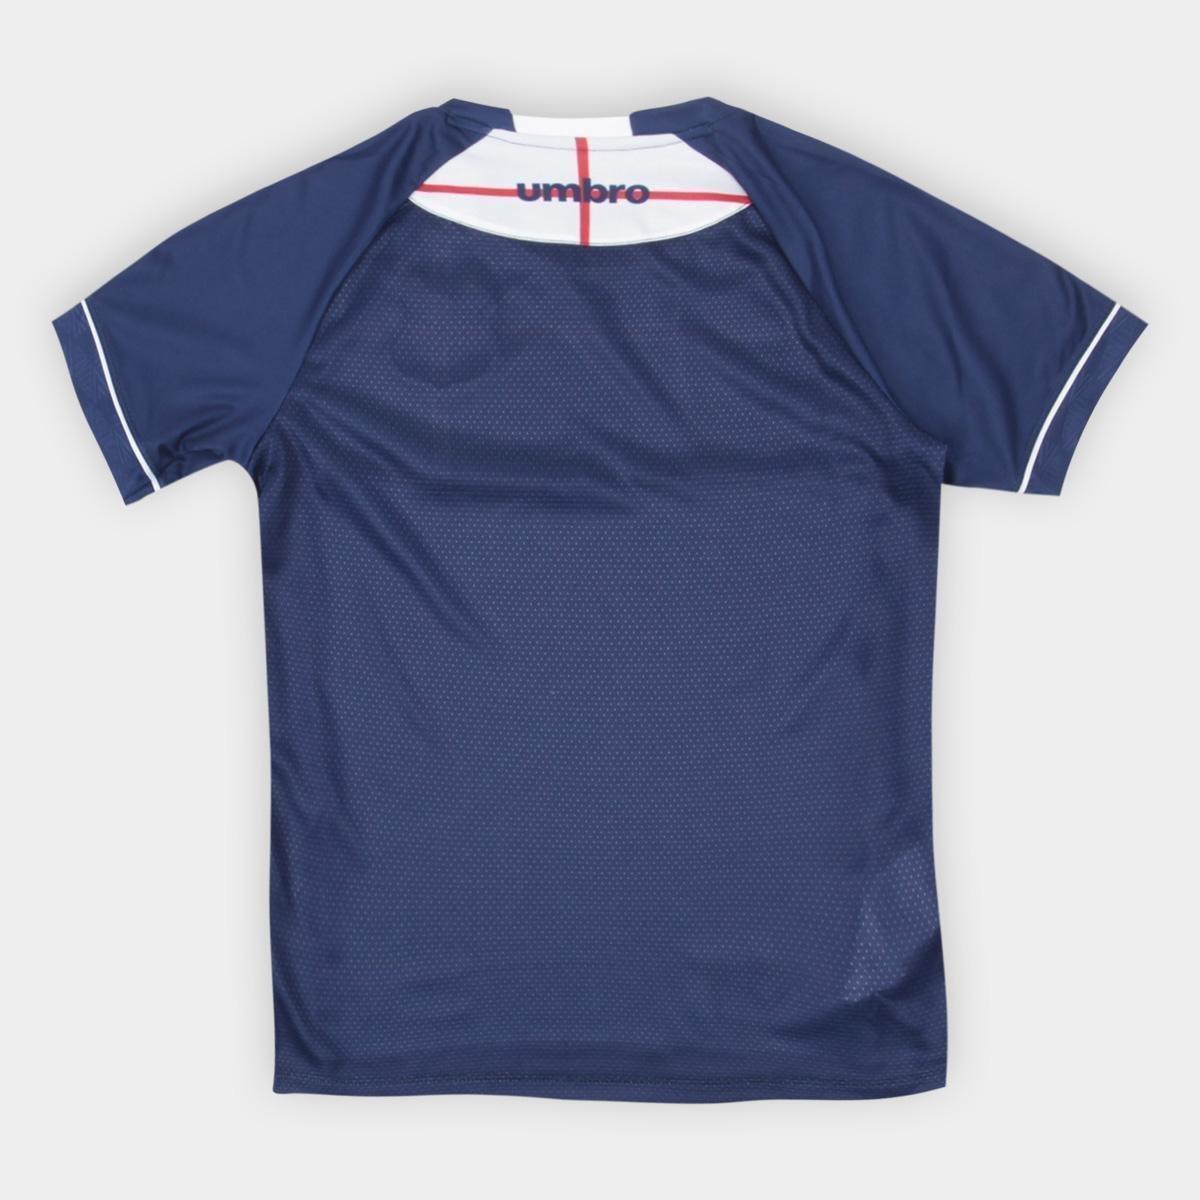 ... e 2018 Marinho Infantil Kingdom Branco Torcedor Umbro The s n° Santos  Camisa qa7wEg7v ... c560948baedf5